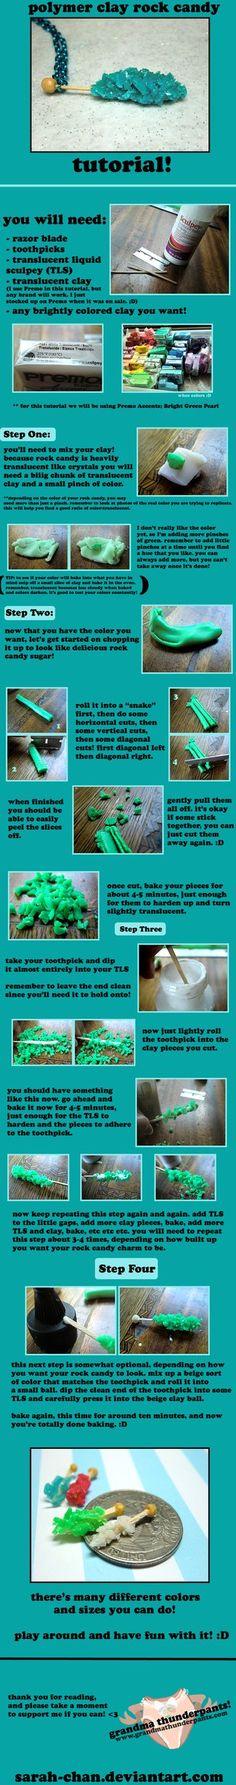 Polymer Clay ROCK CANDY TUTORIAL by *GrandmaThunderpants on deviantART